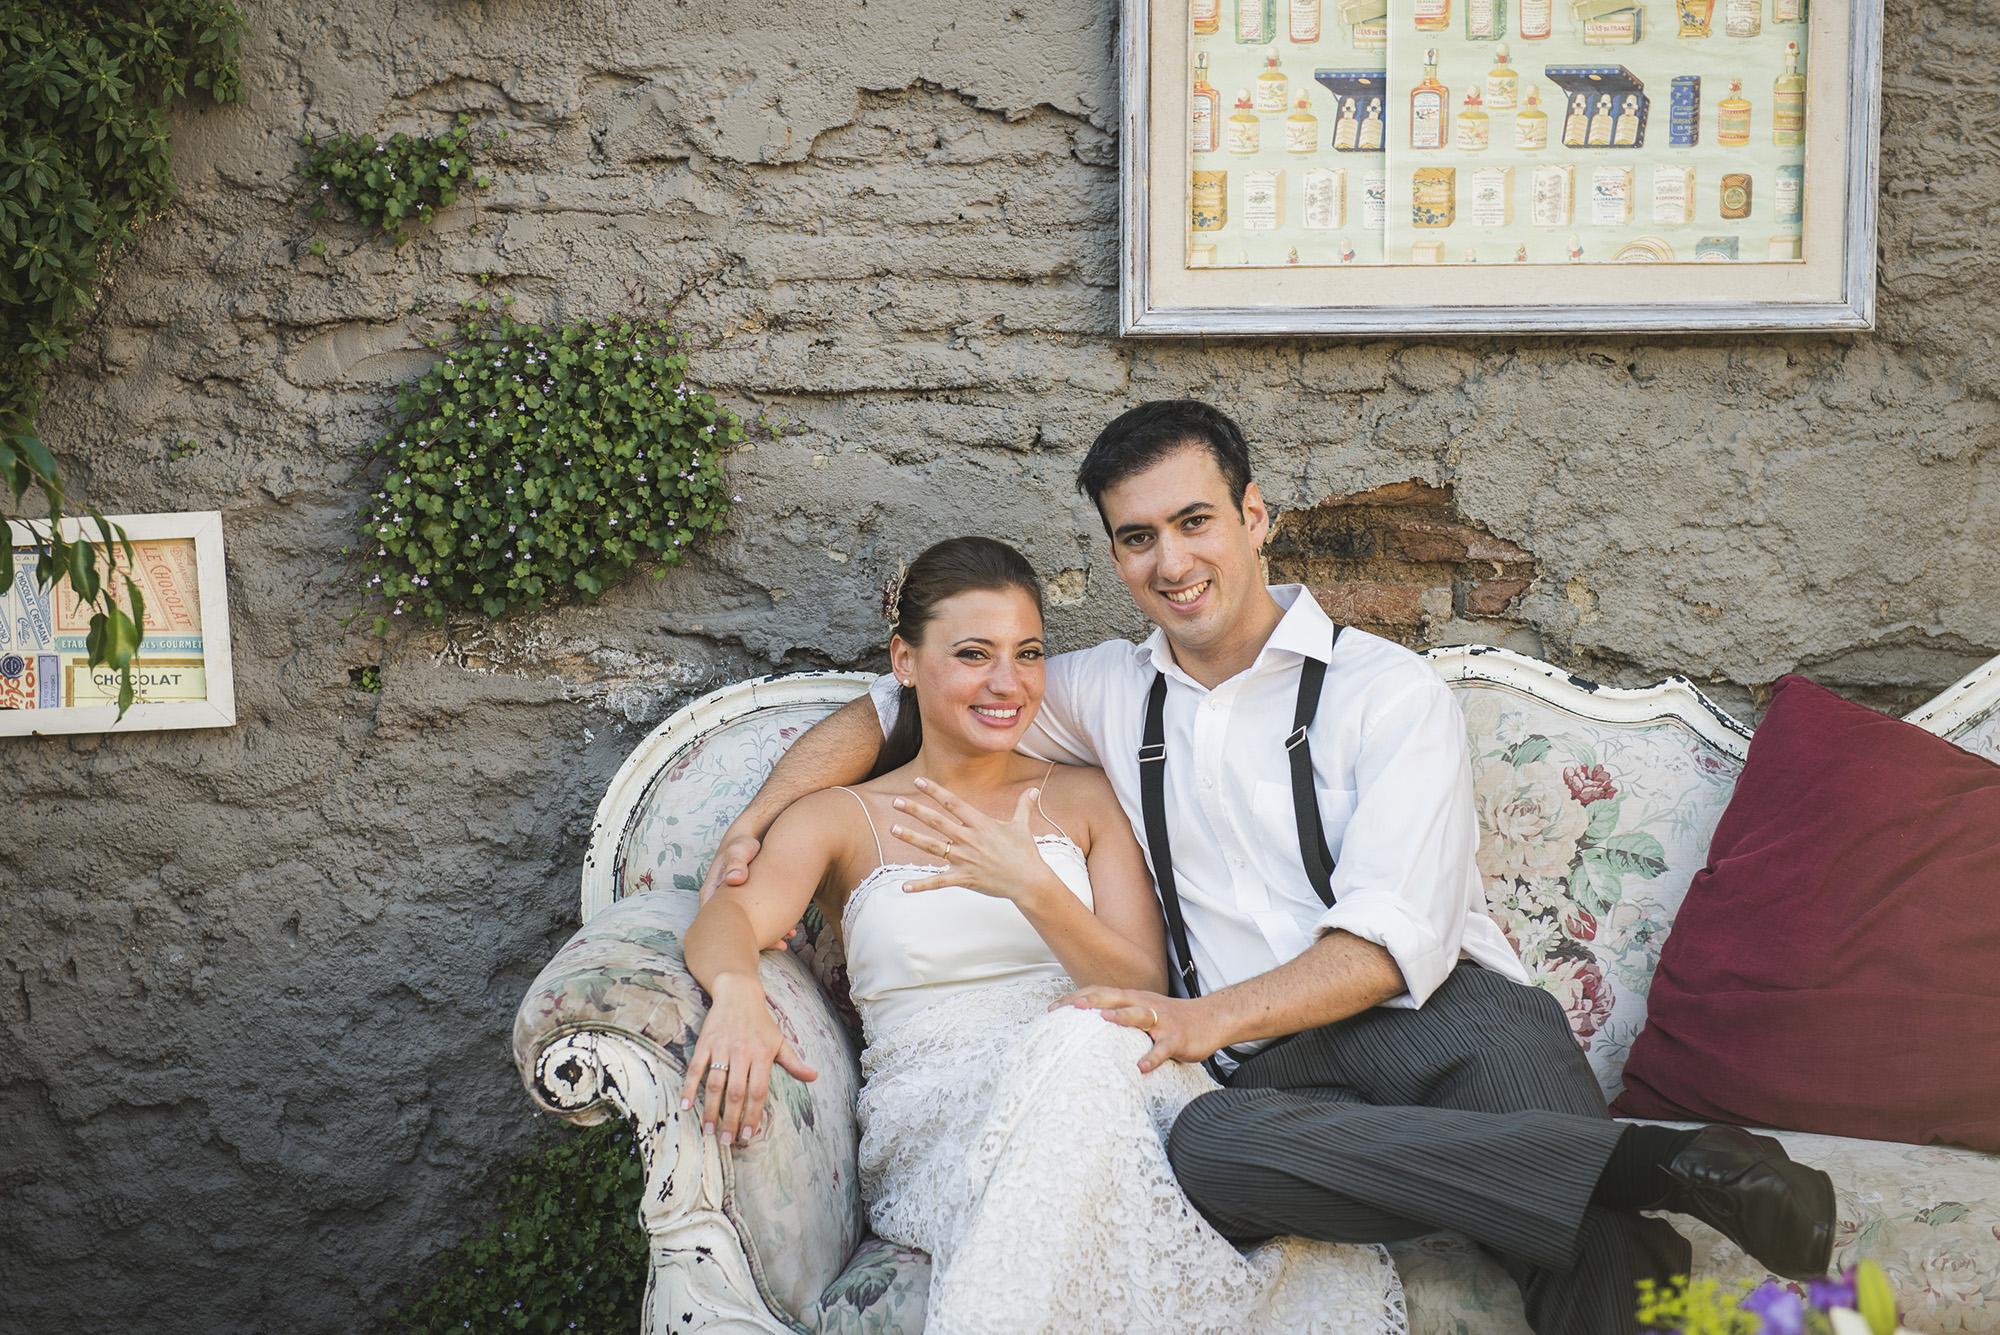 patricia-riba-casamiento-montevideo-uruguay-lindolfo-64